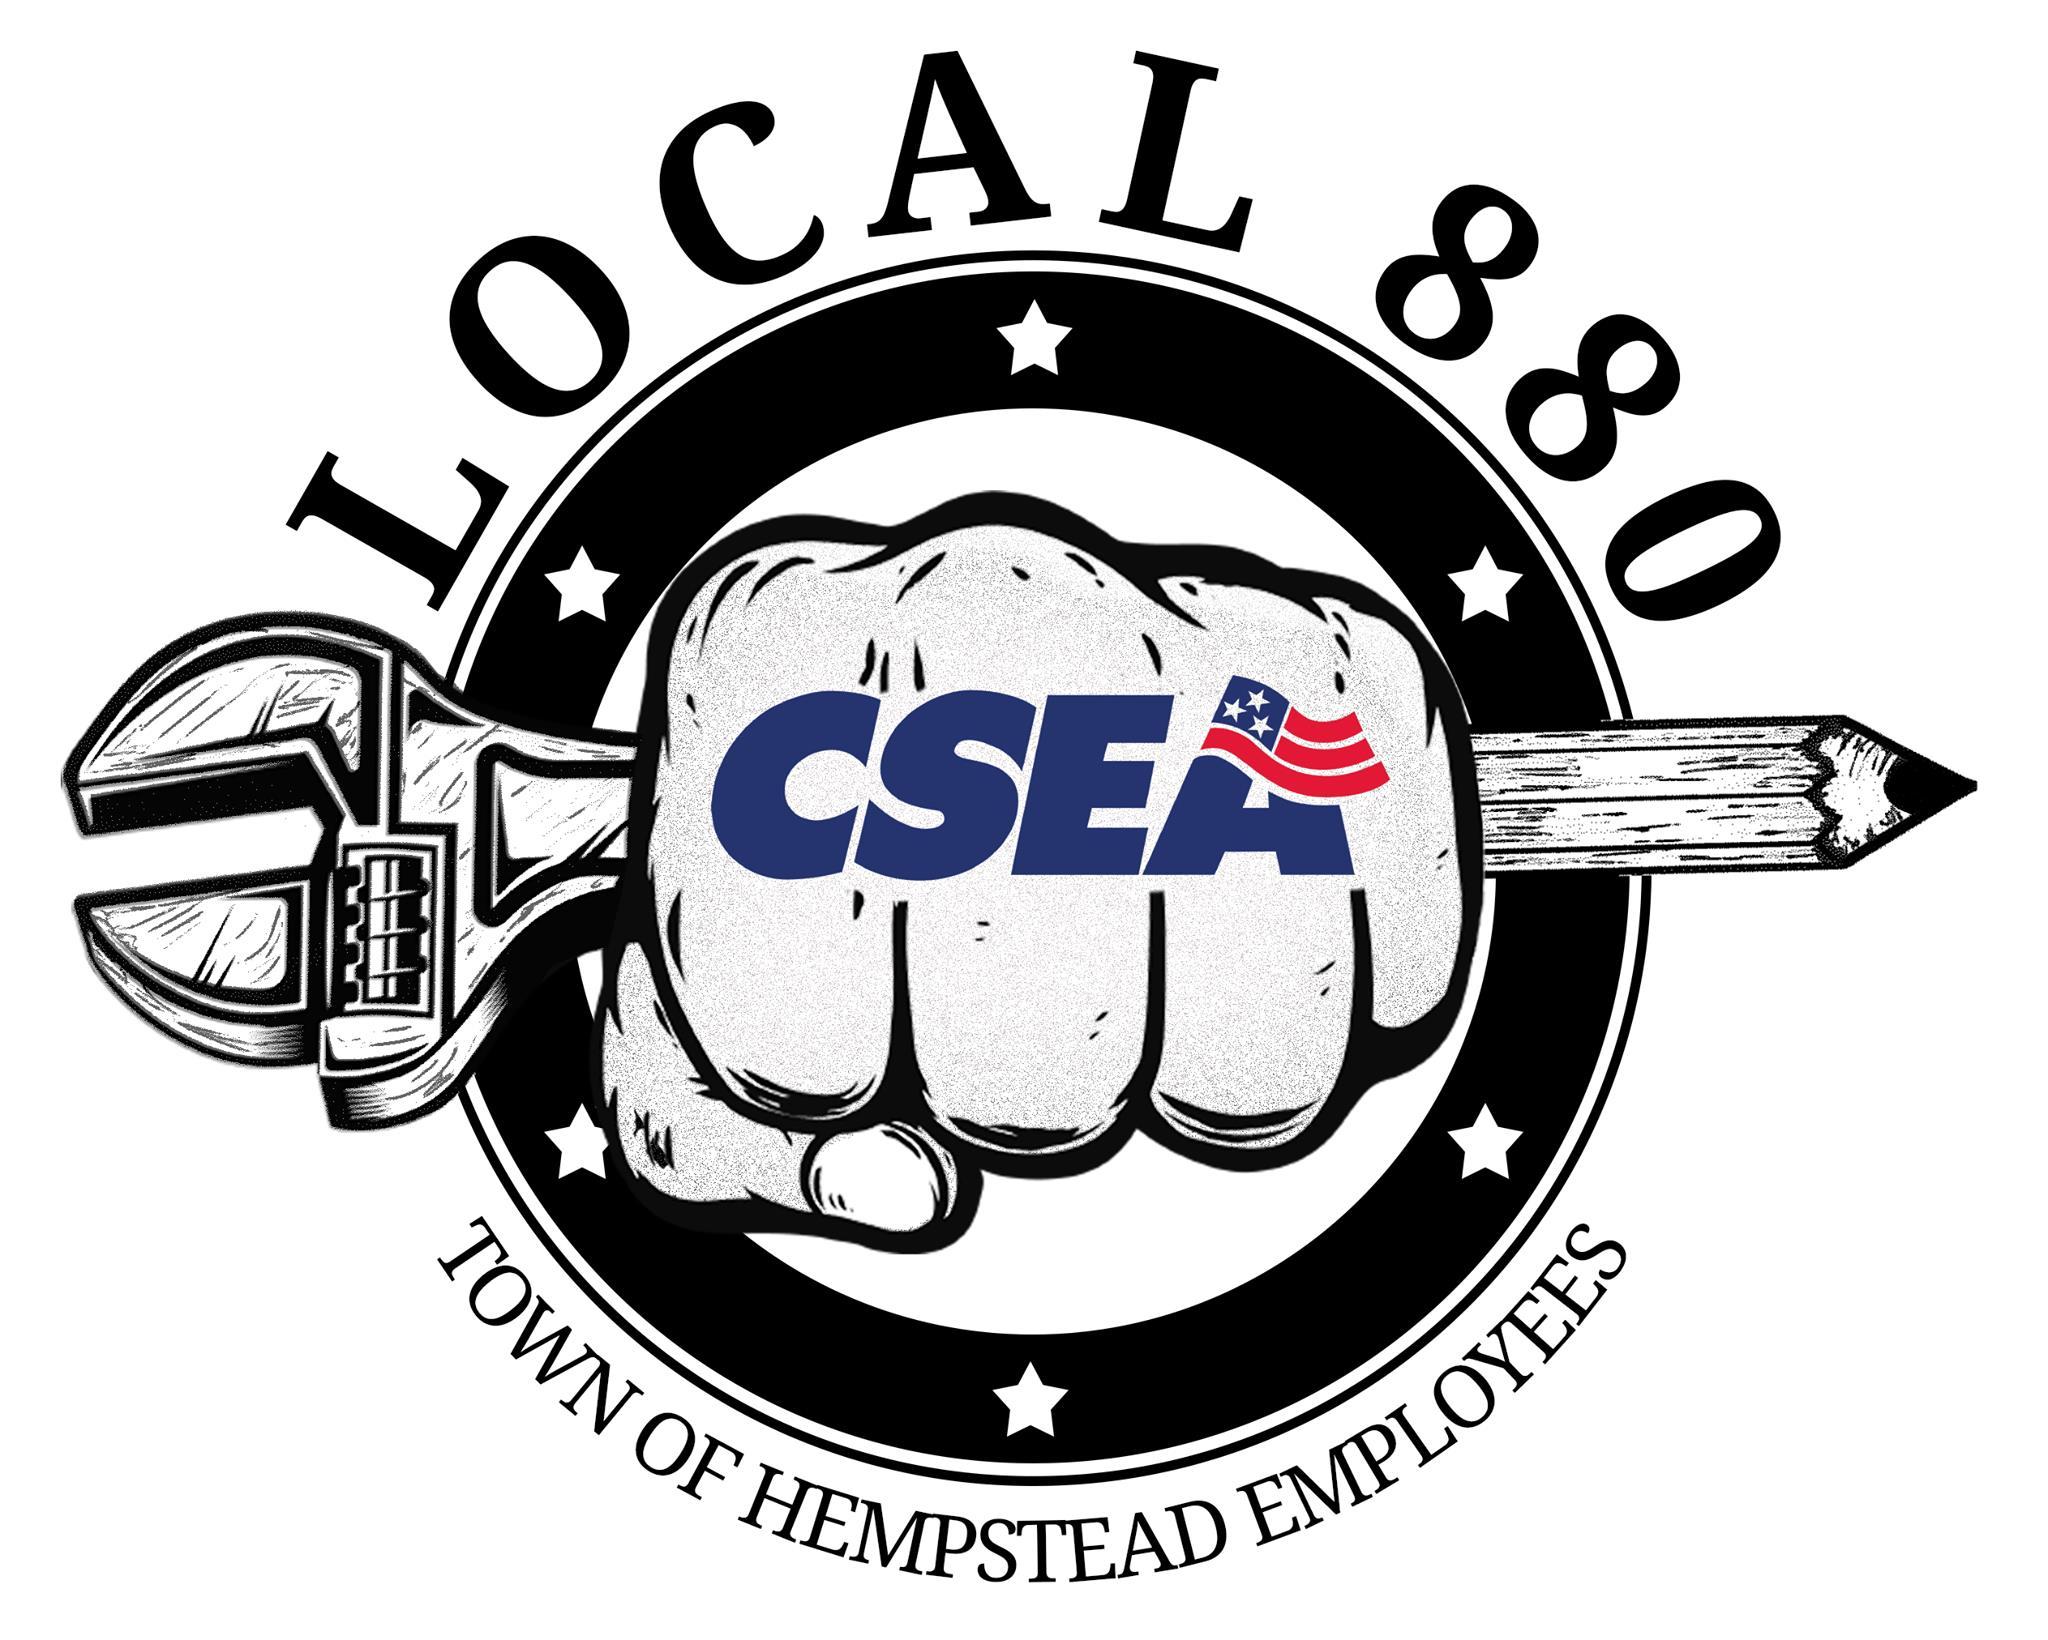 CSEA Headquarters